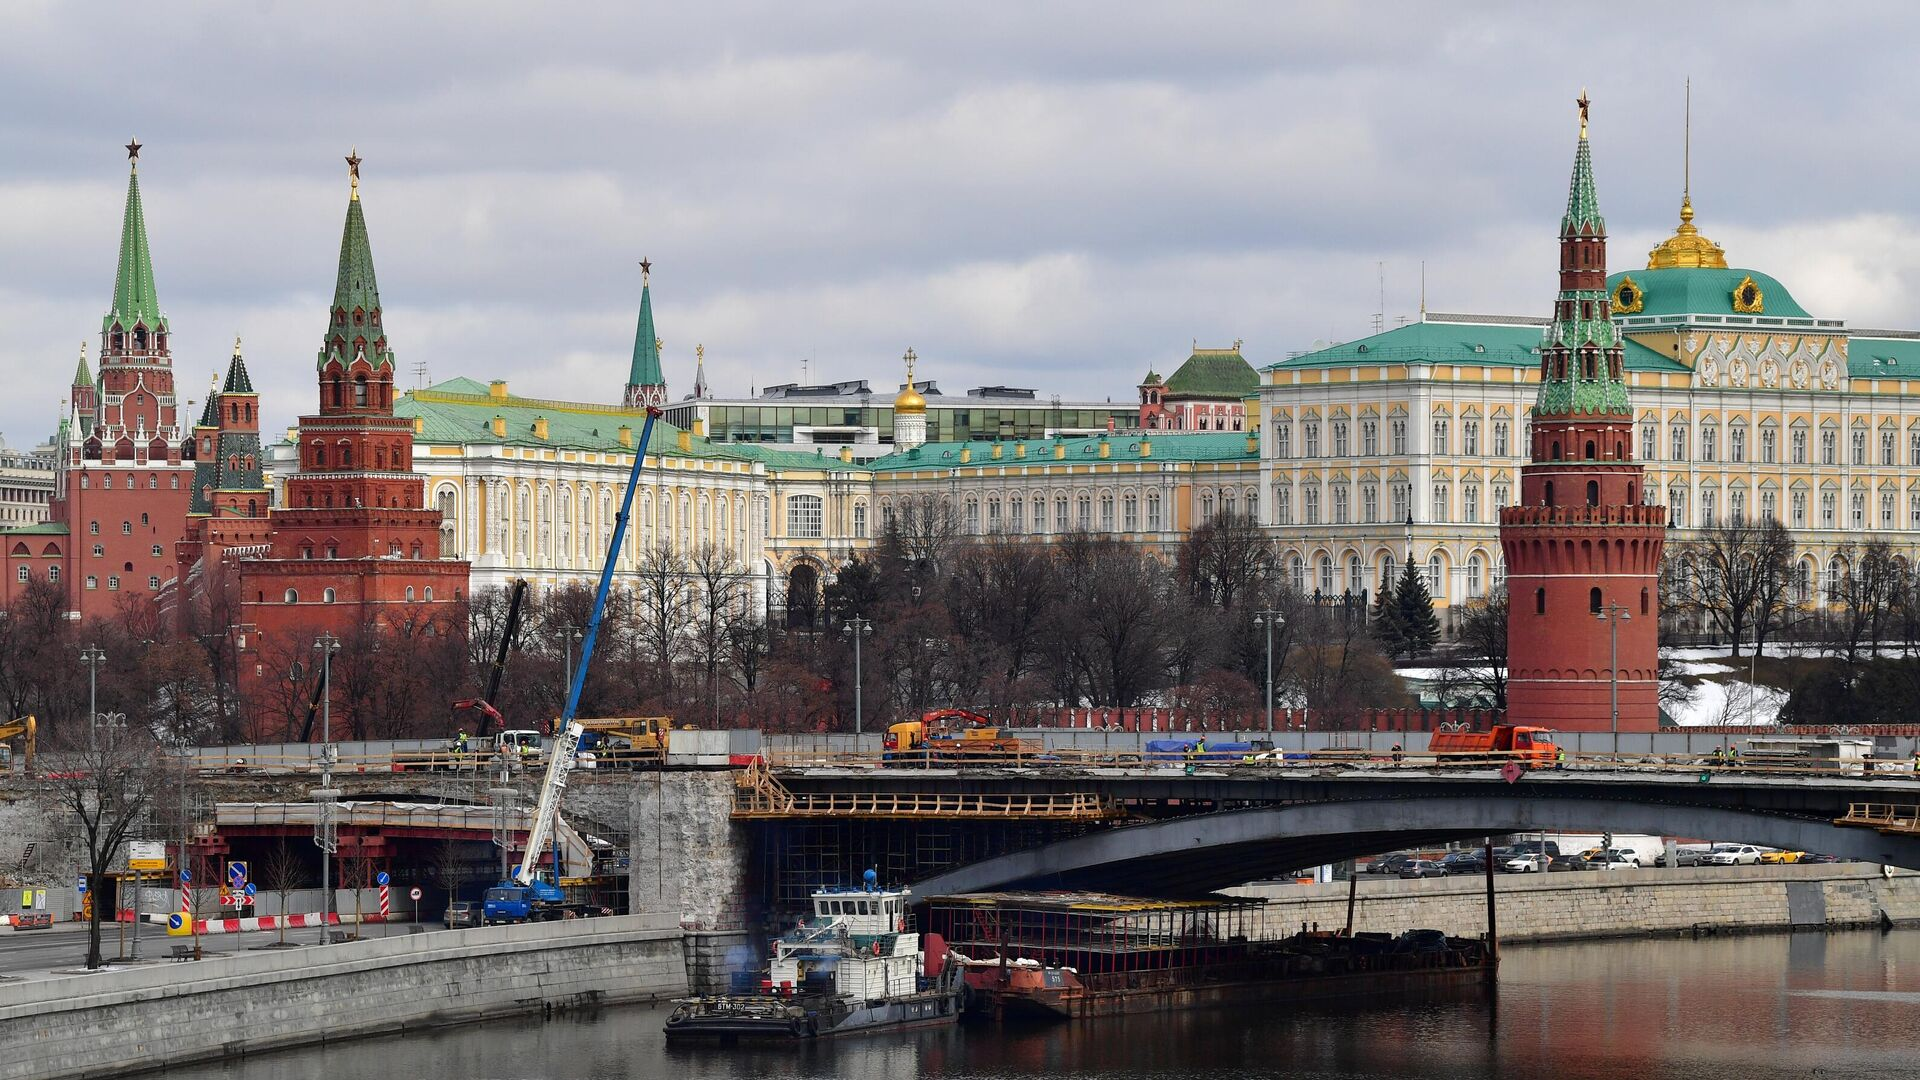 El Kremlin de Moscú - Sputnik Mundo, 1920, 19.03.2021